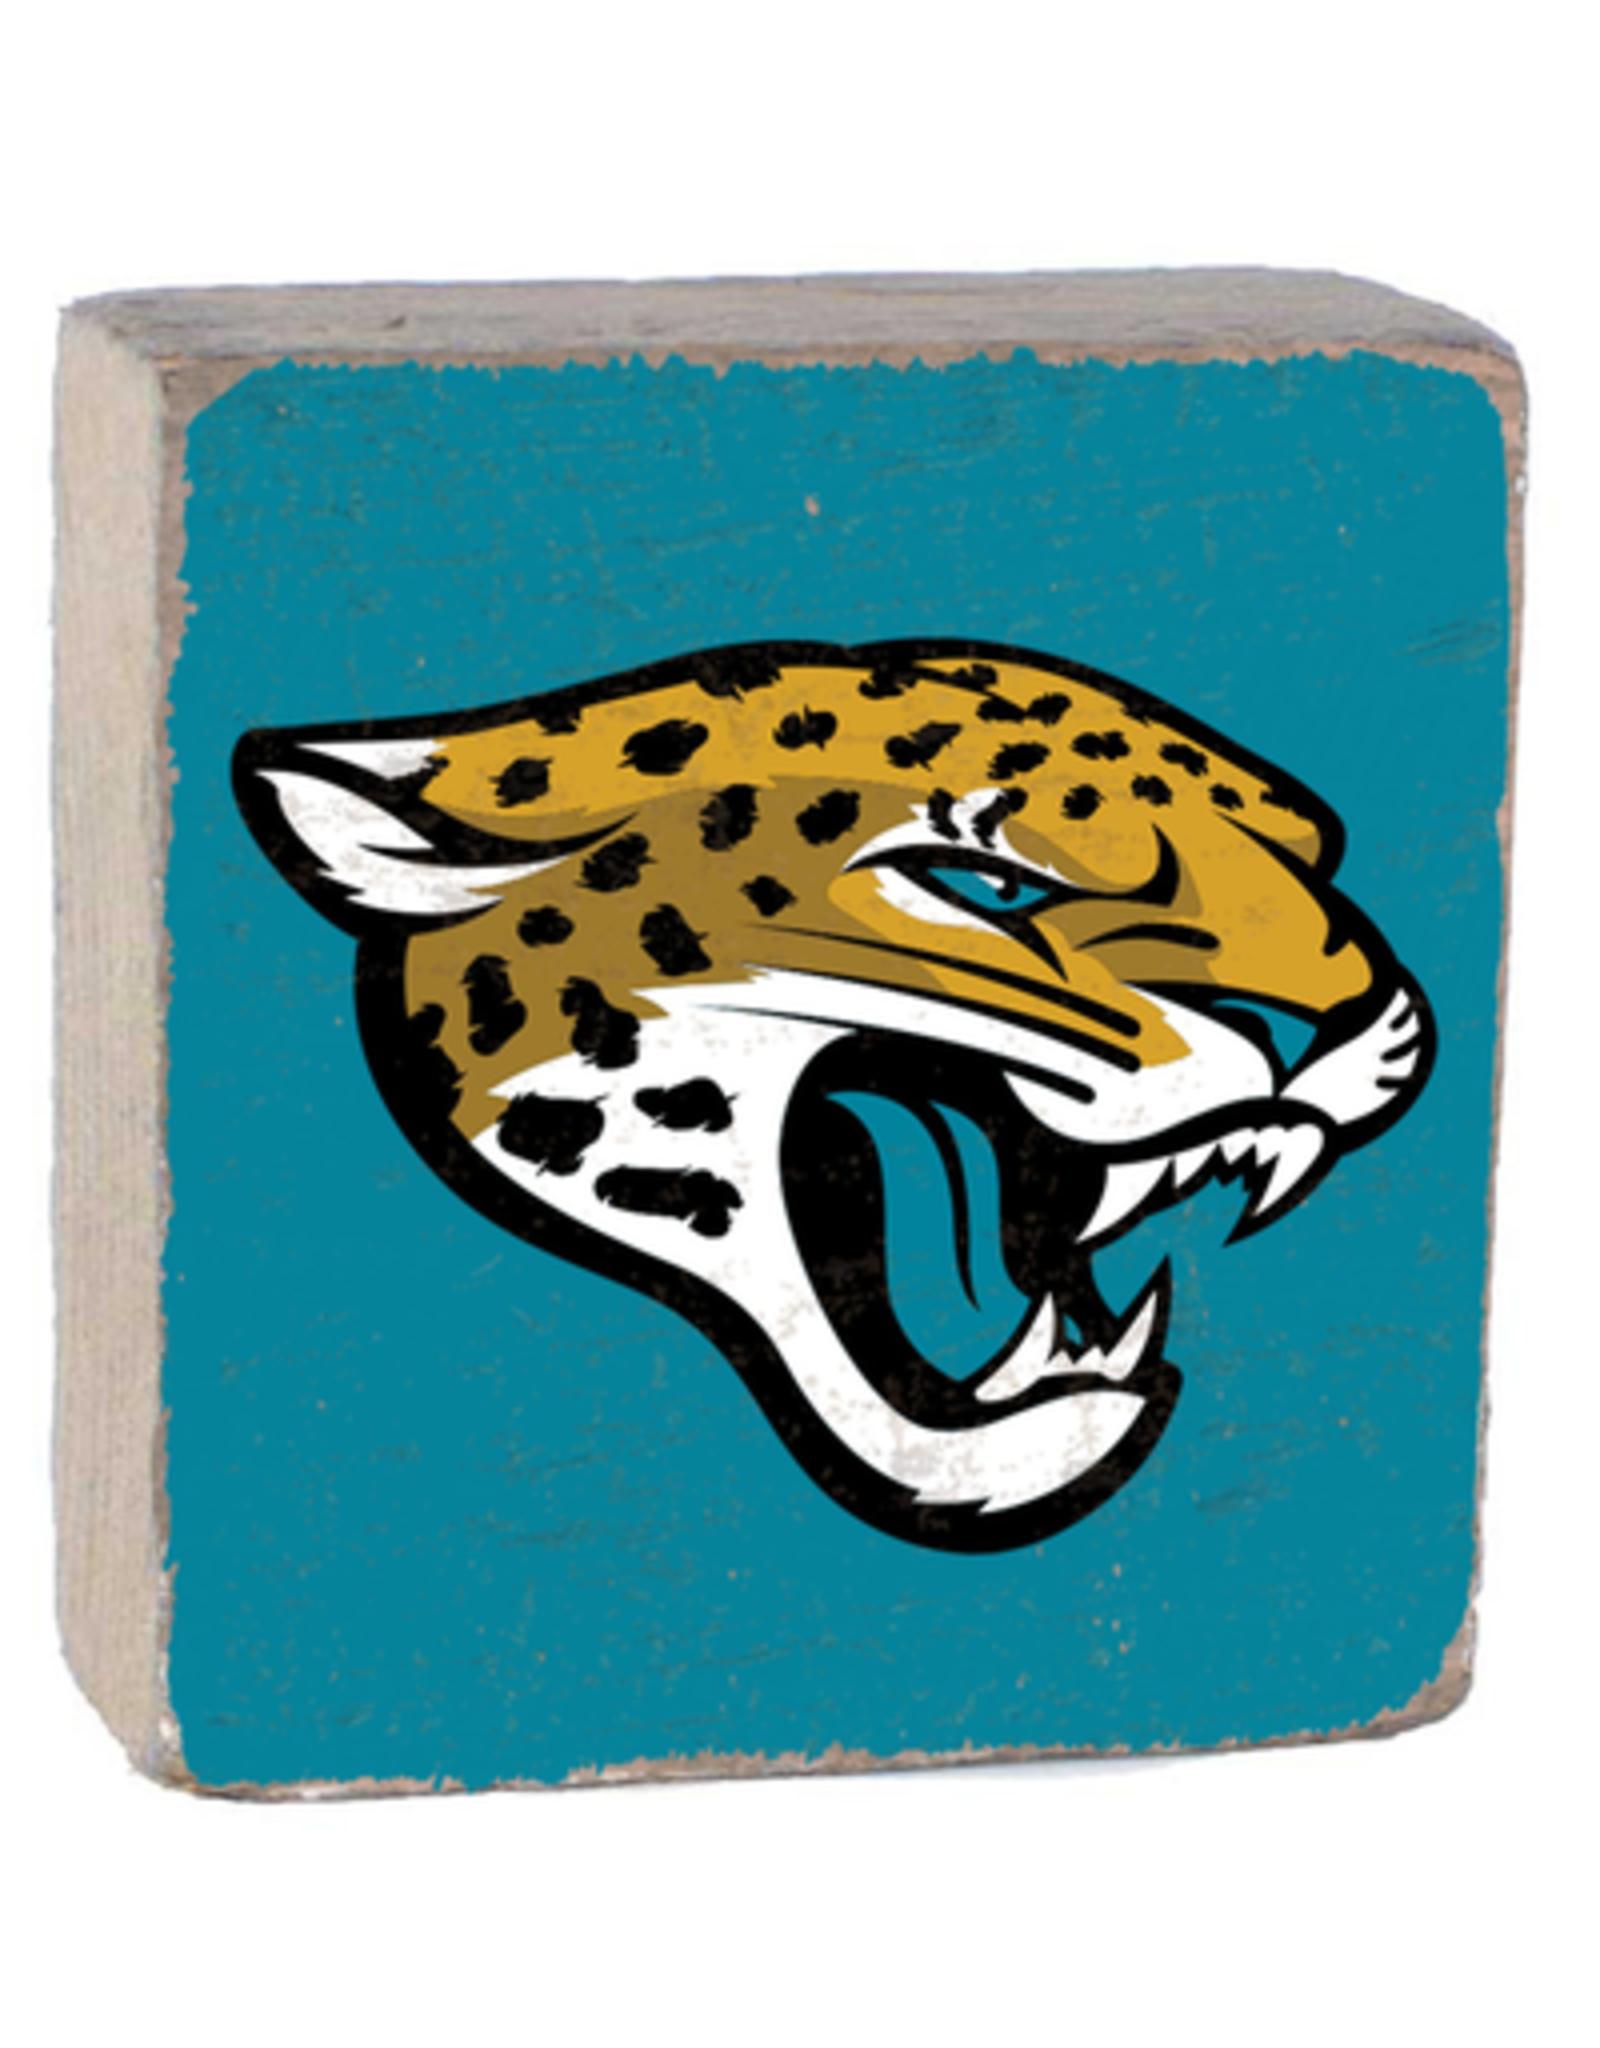 RUSTIC MARLIN Jacksonville Jaguars Rustic Wood Team Block